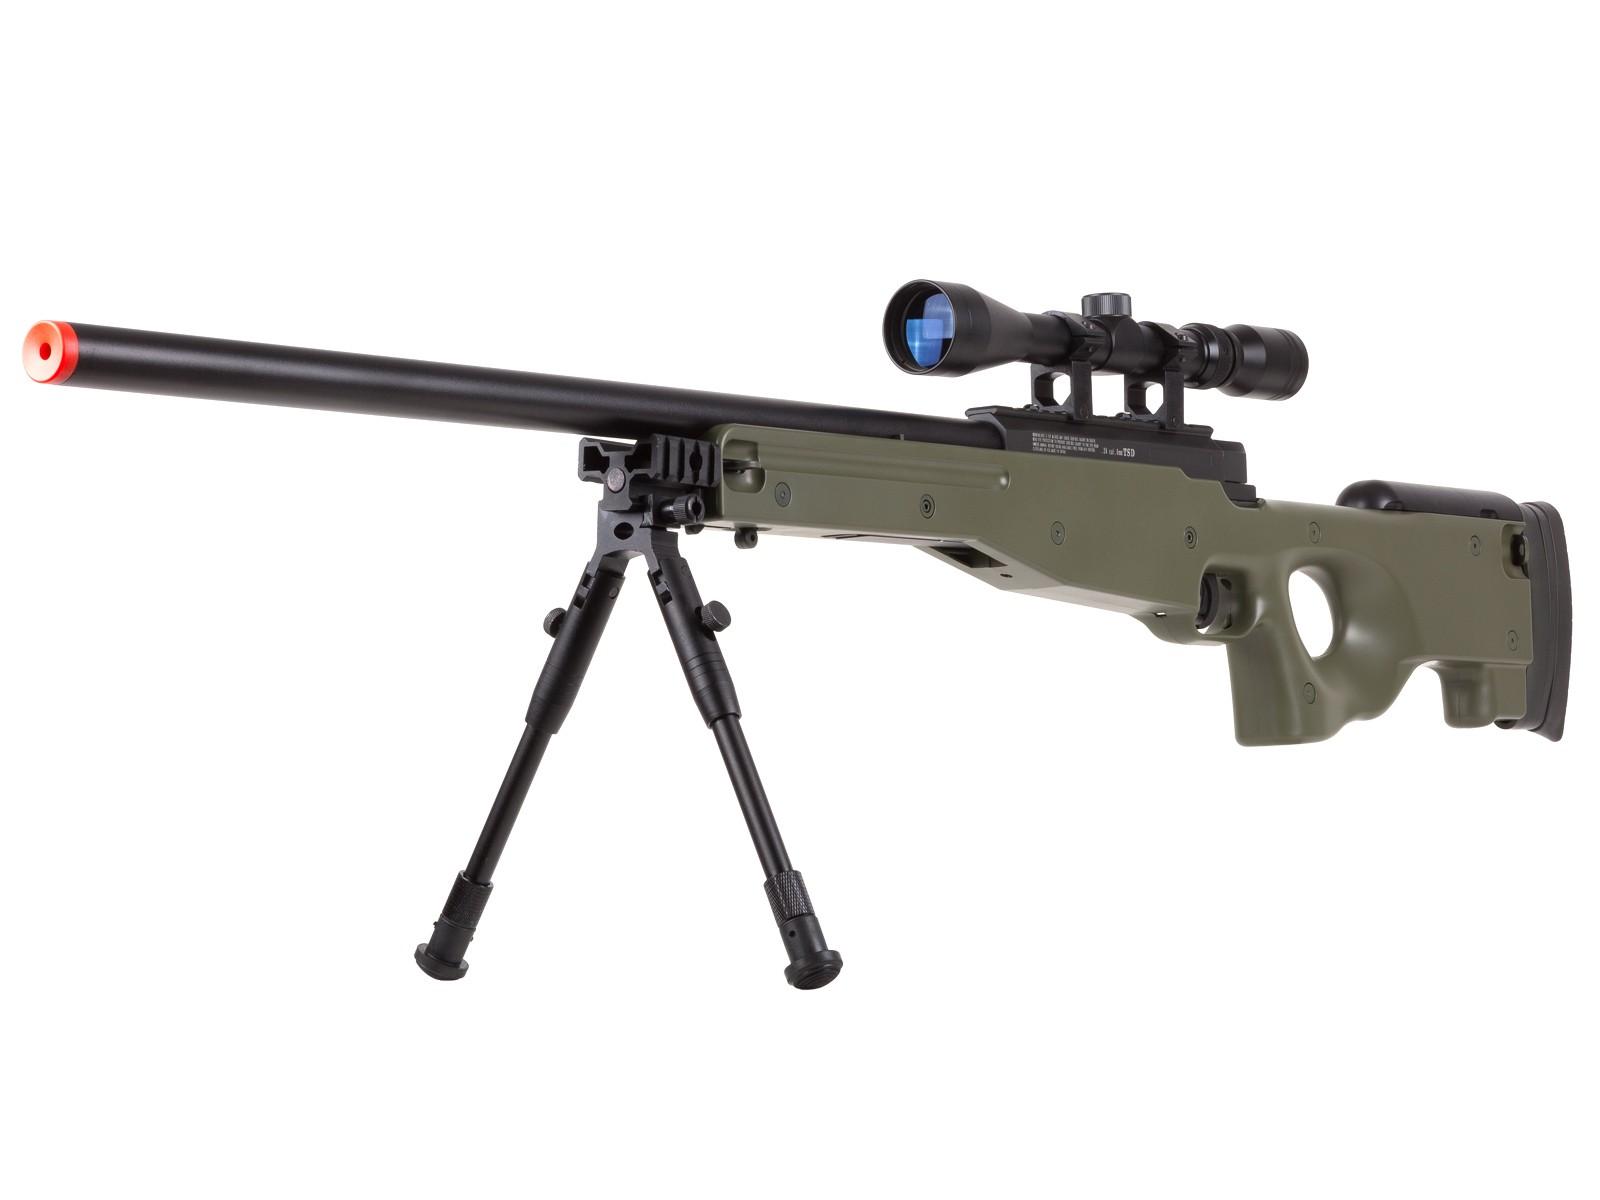 TSD_Tactical_Series_Type_96_Sniper_Green_Rifle_6mm